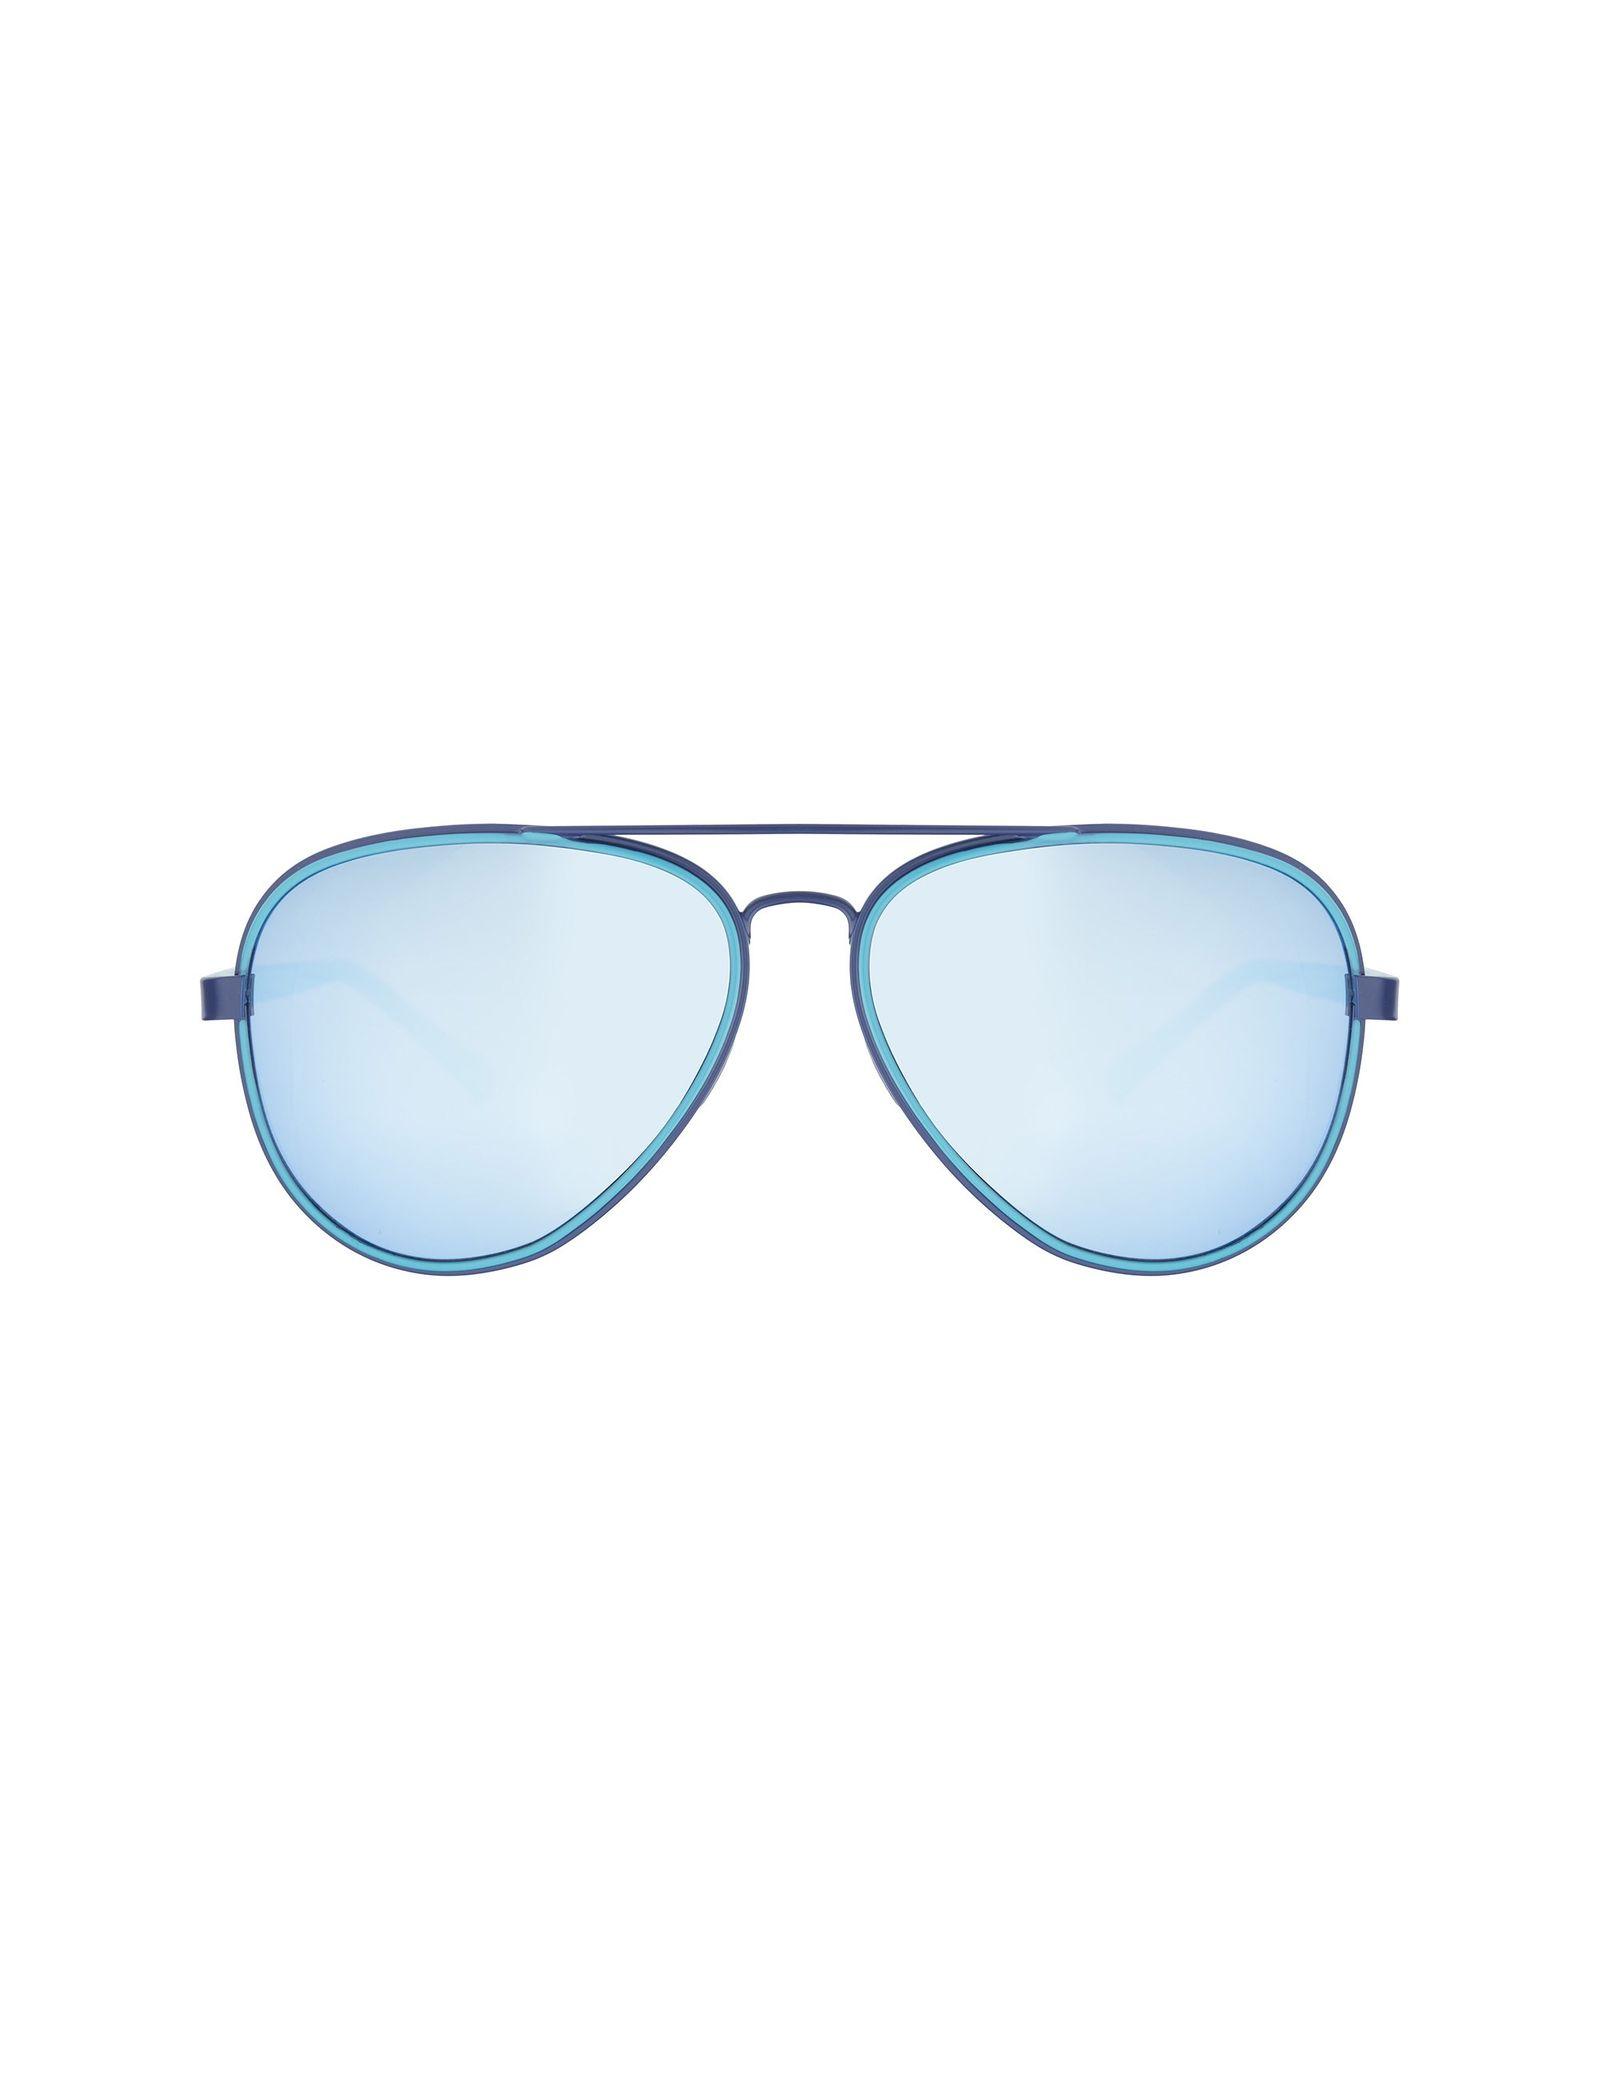 عینک آفتابی خلبانی زنانه - پپه جینز - آبي روشن - 1